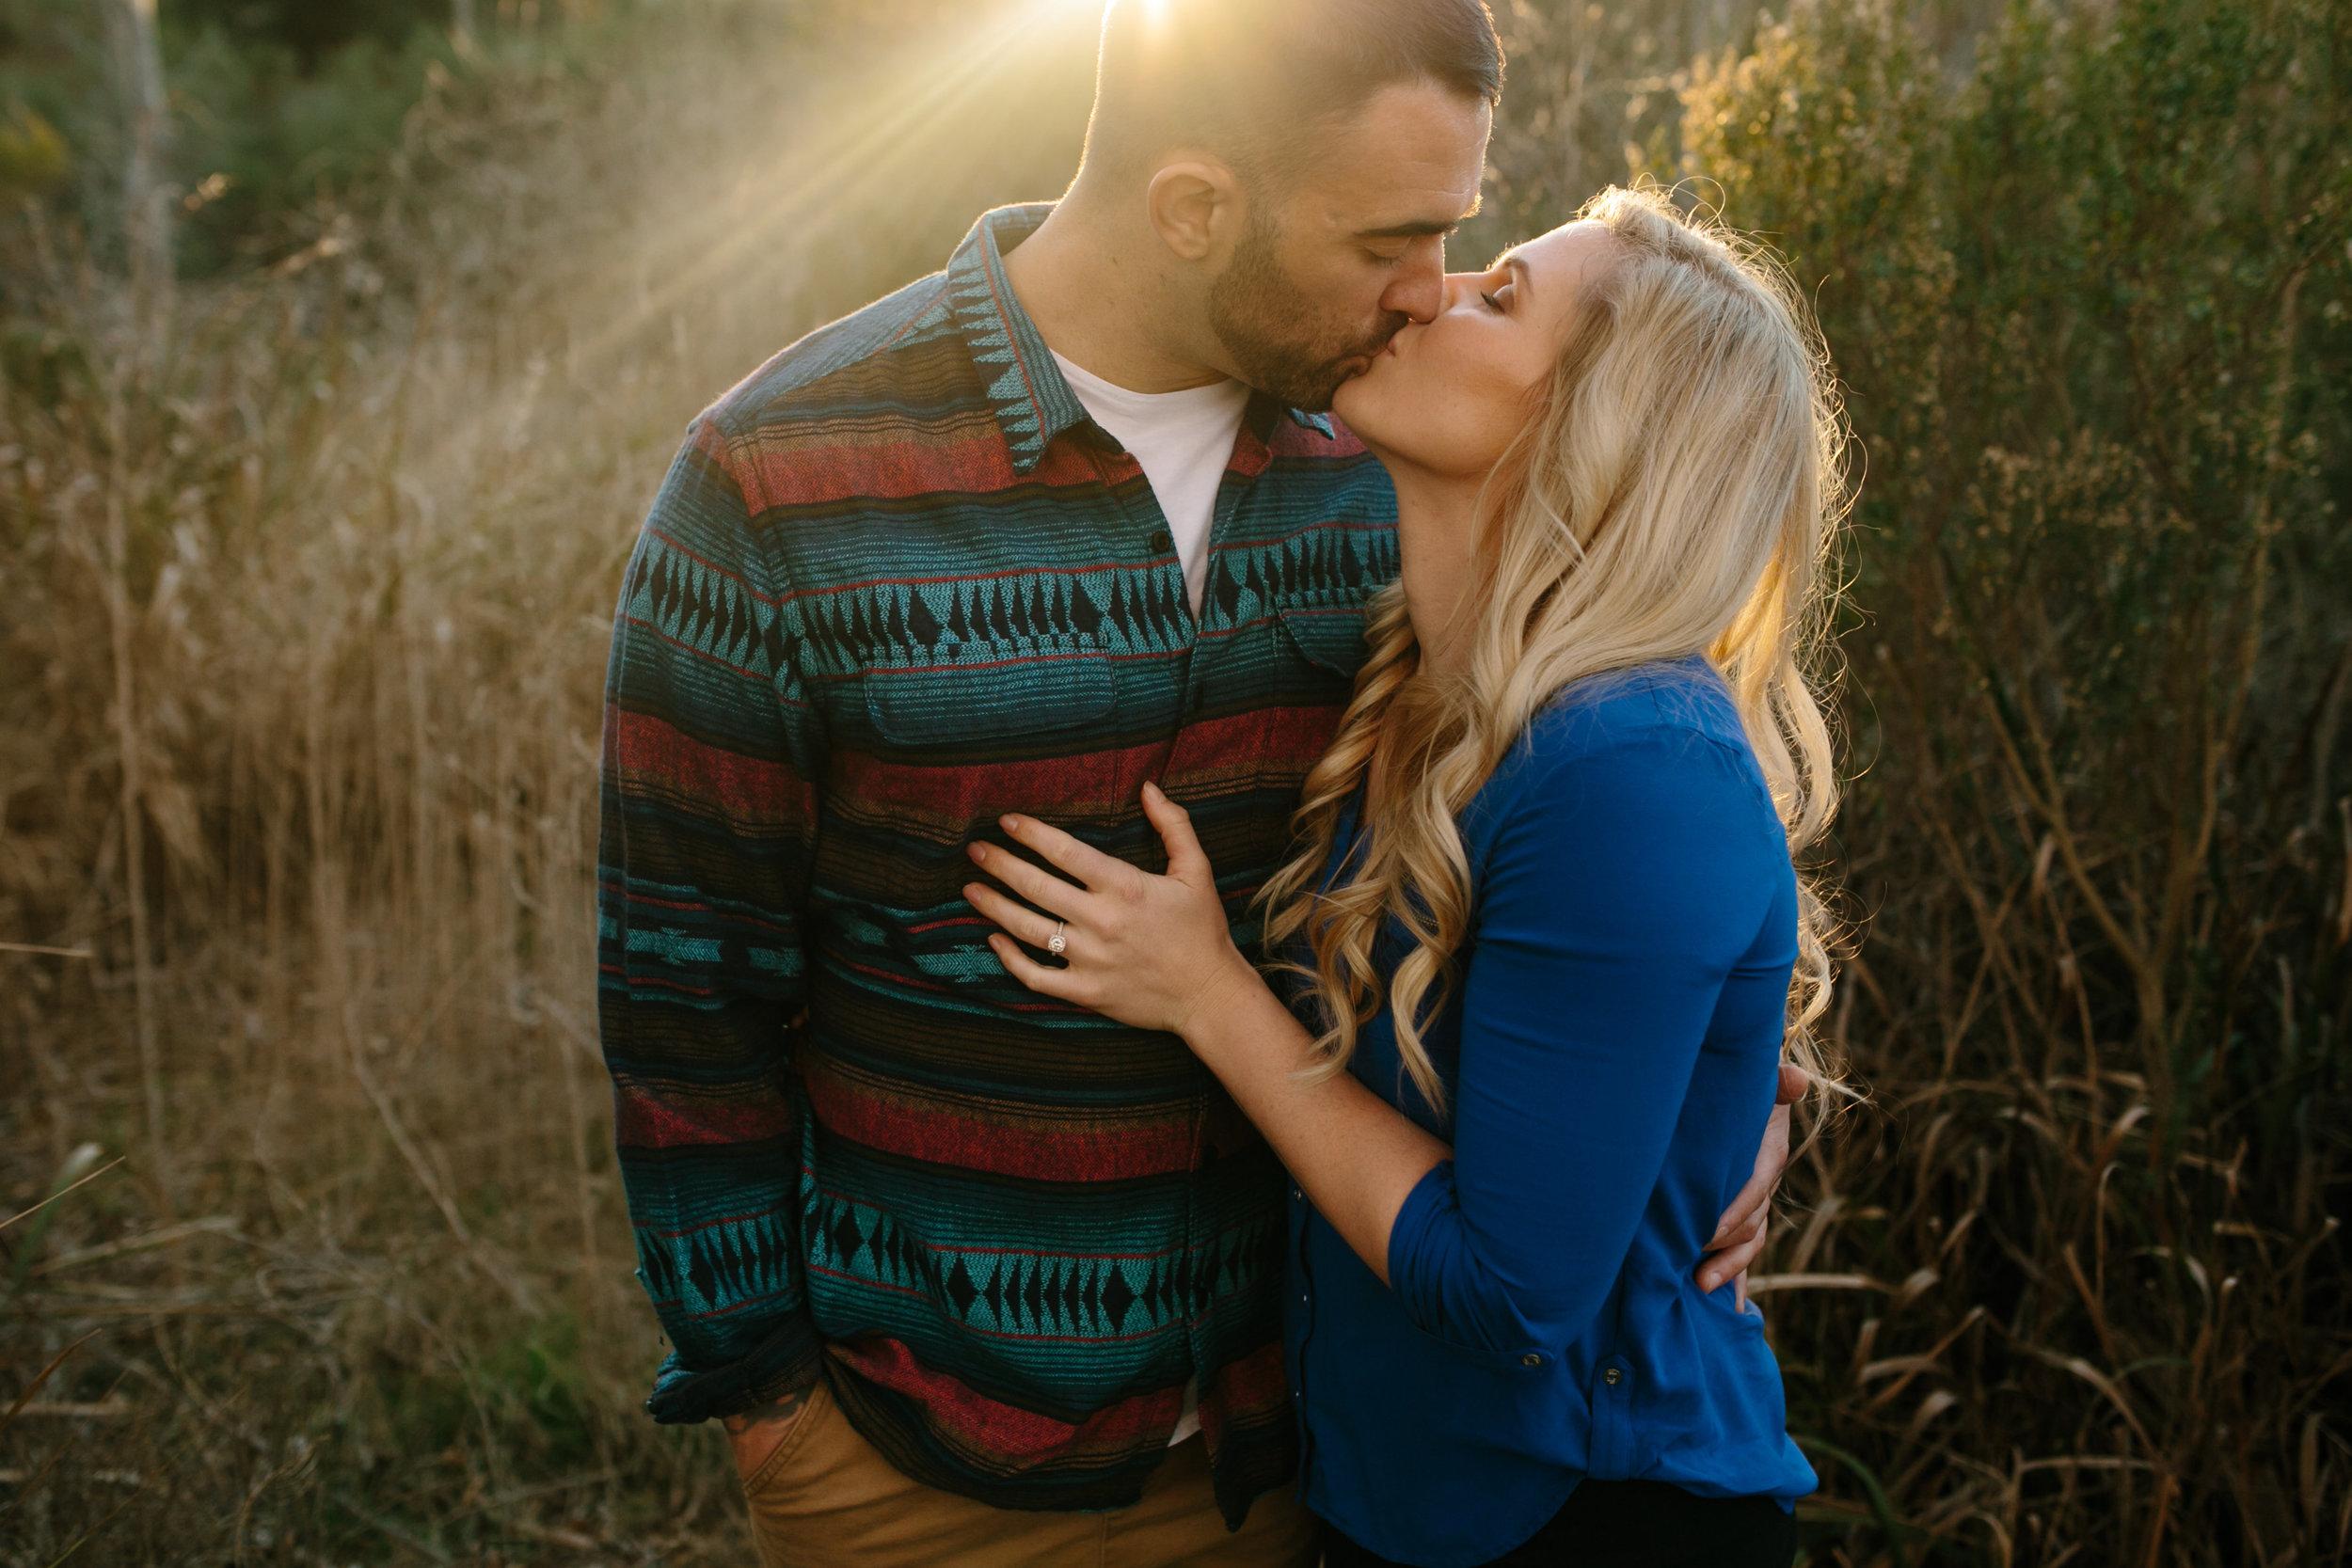 Erin&Andrew-TheGatheringSeasonxweareleoandkat034-2.jpg